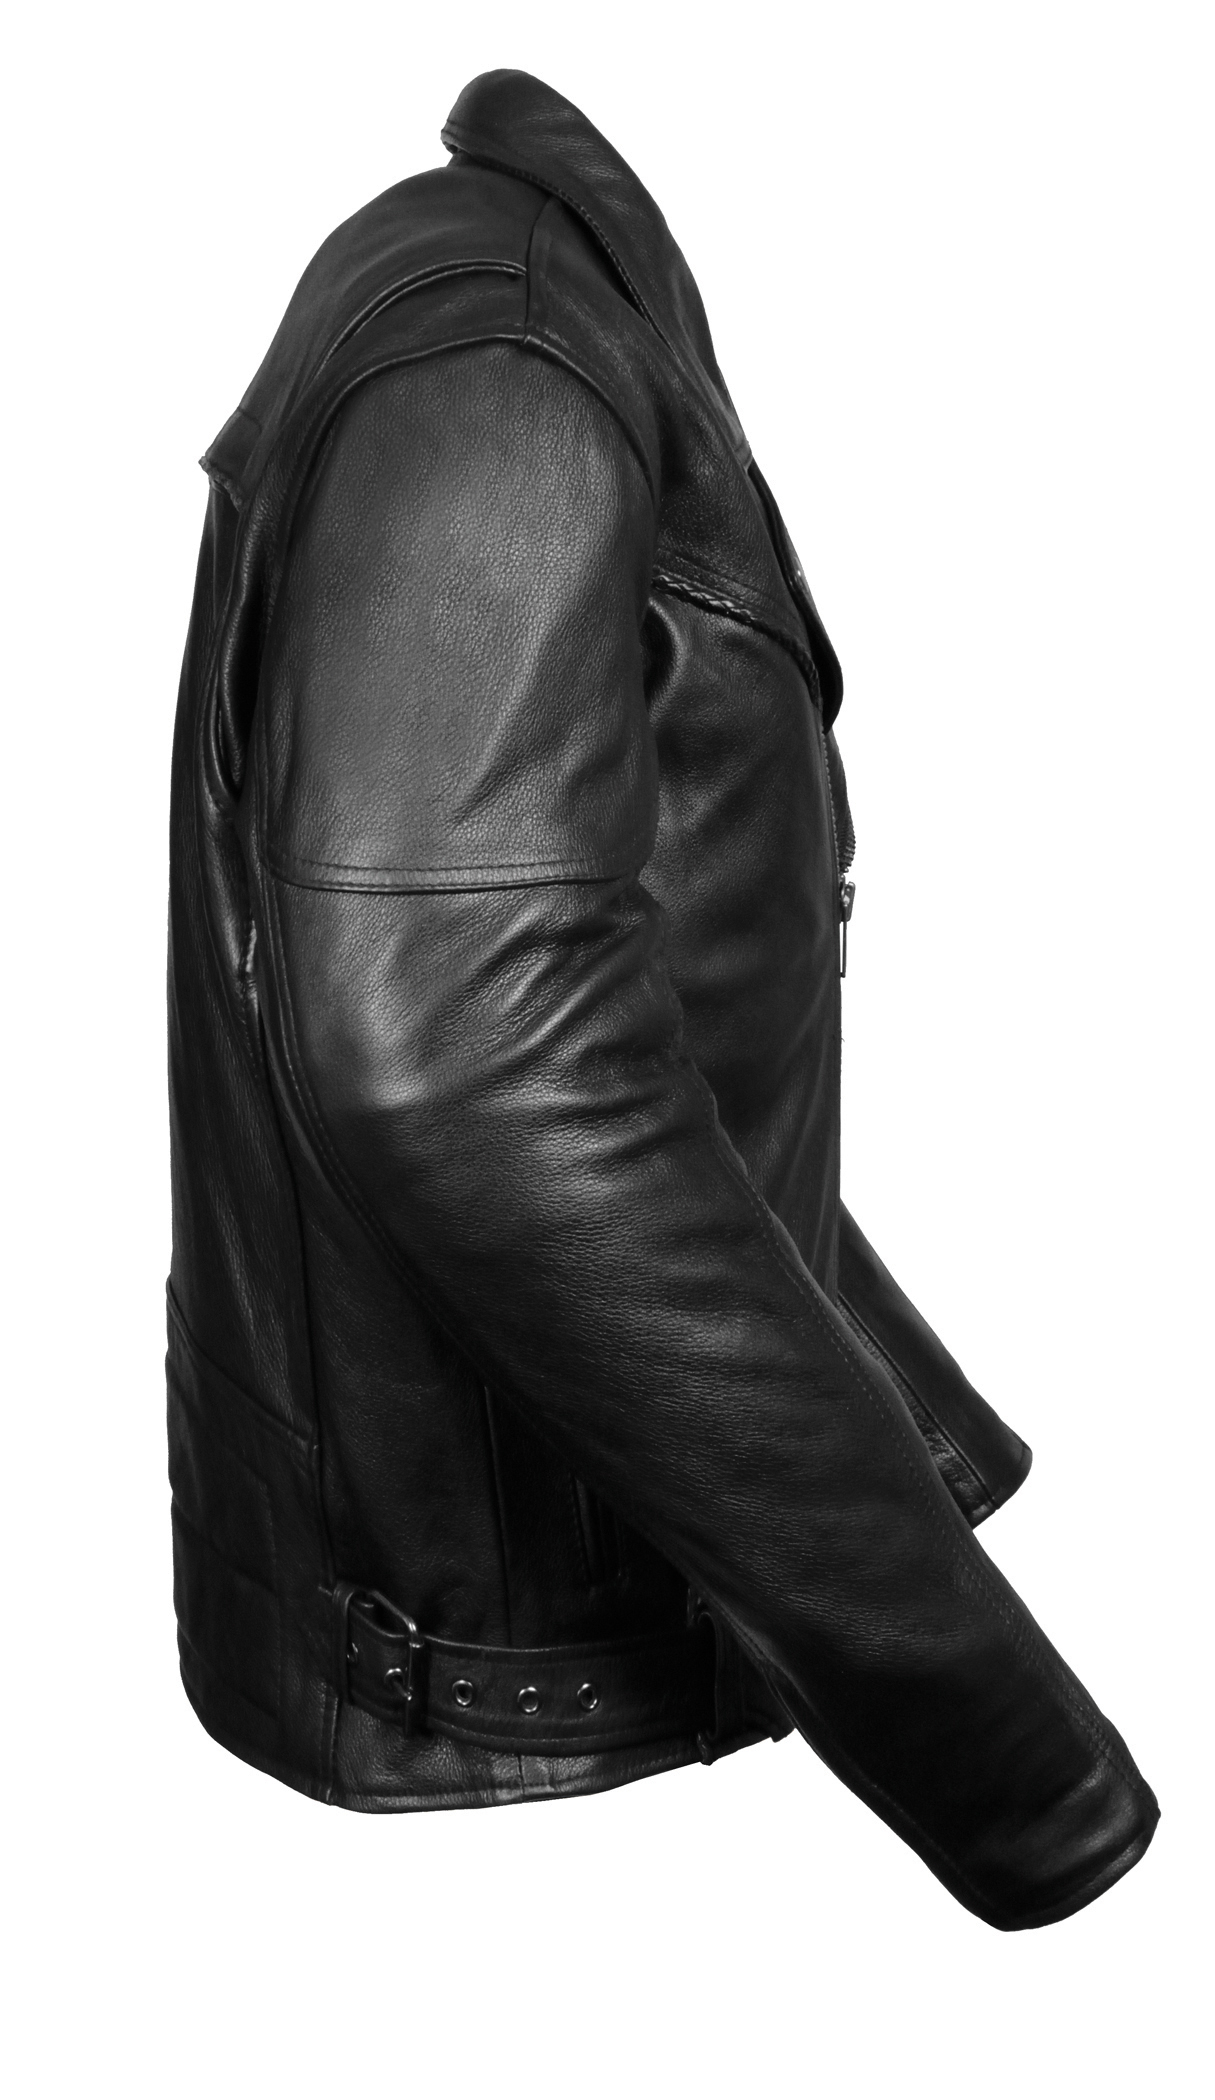 Mens Black Braided Leather Motorcycle Jacket W Utility Pockets